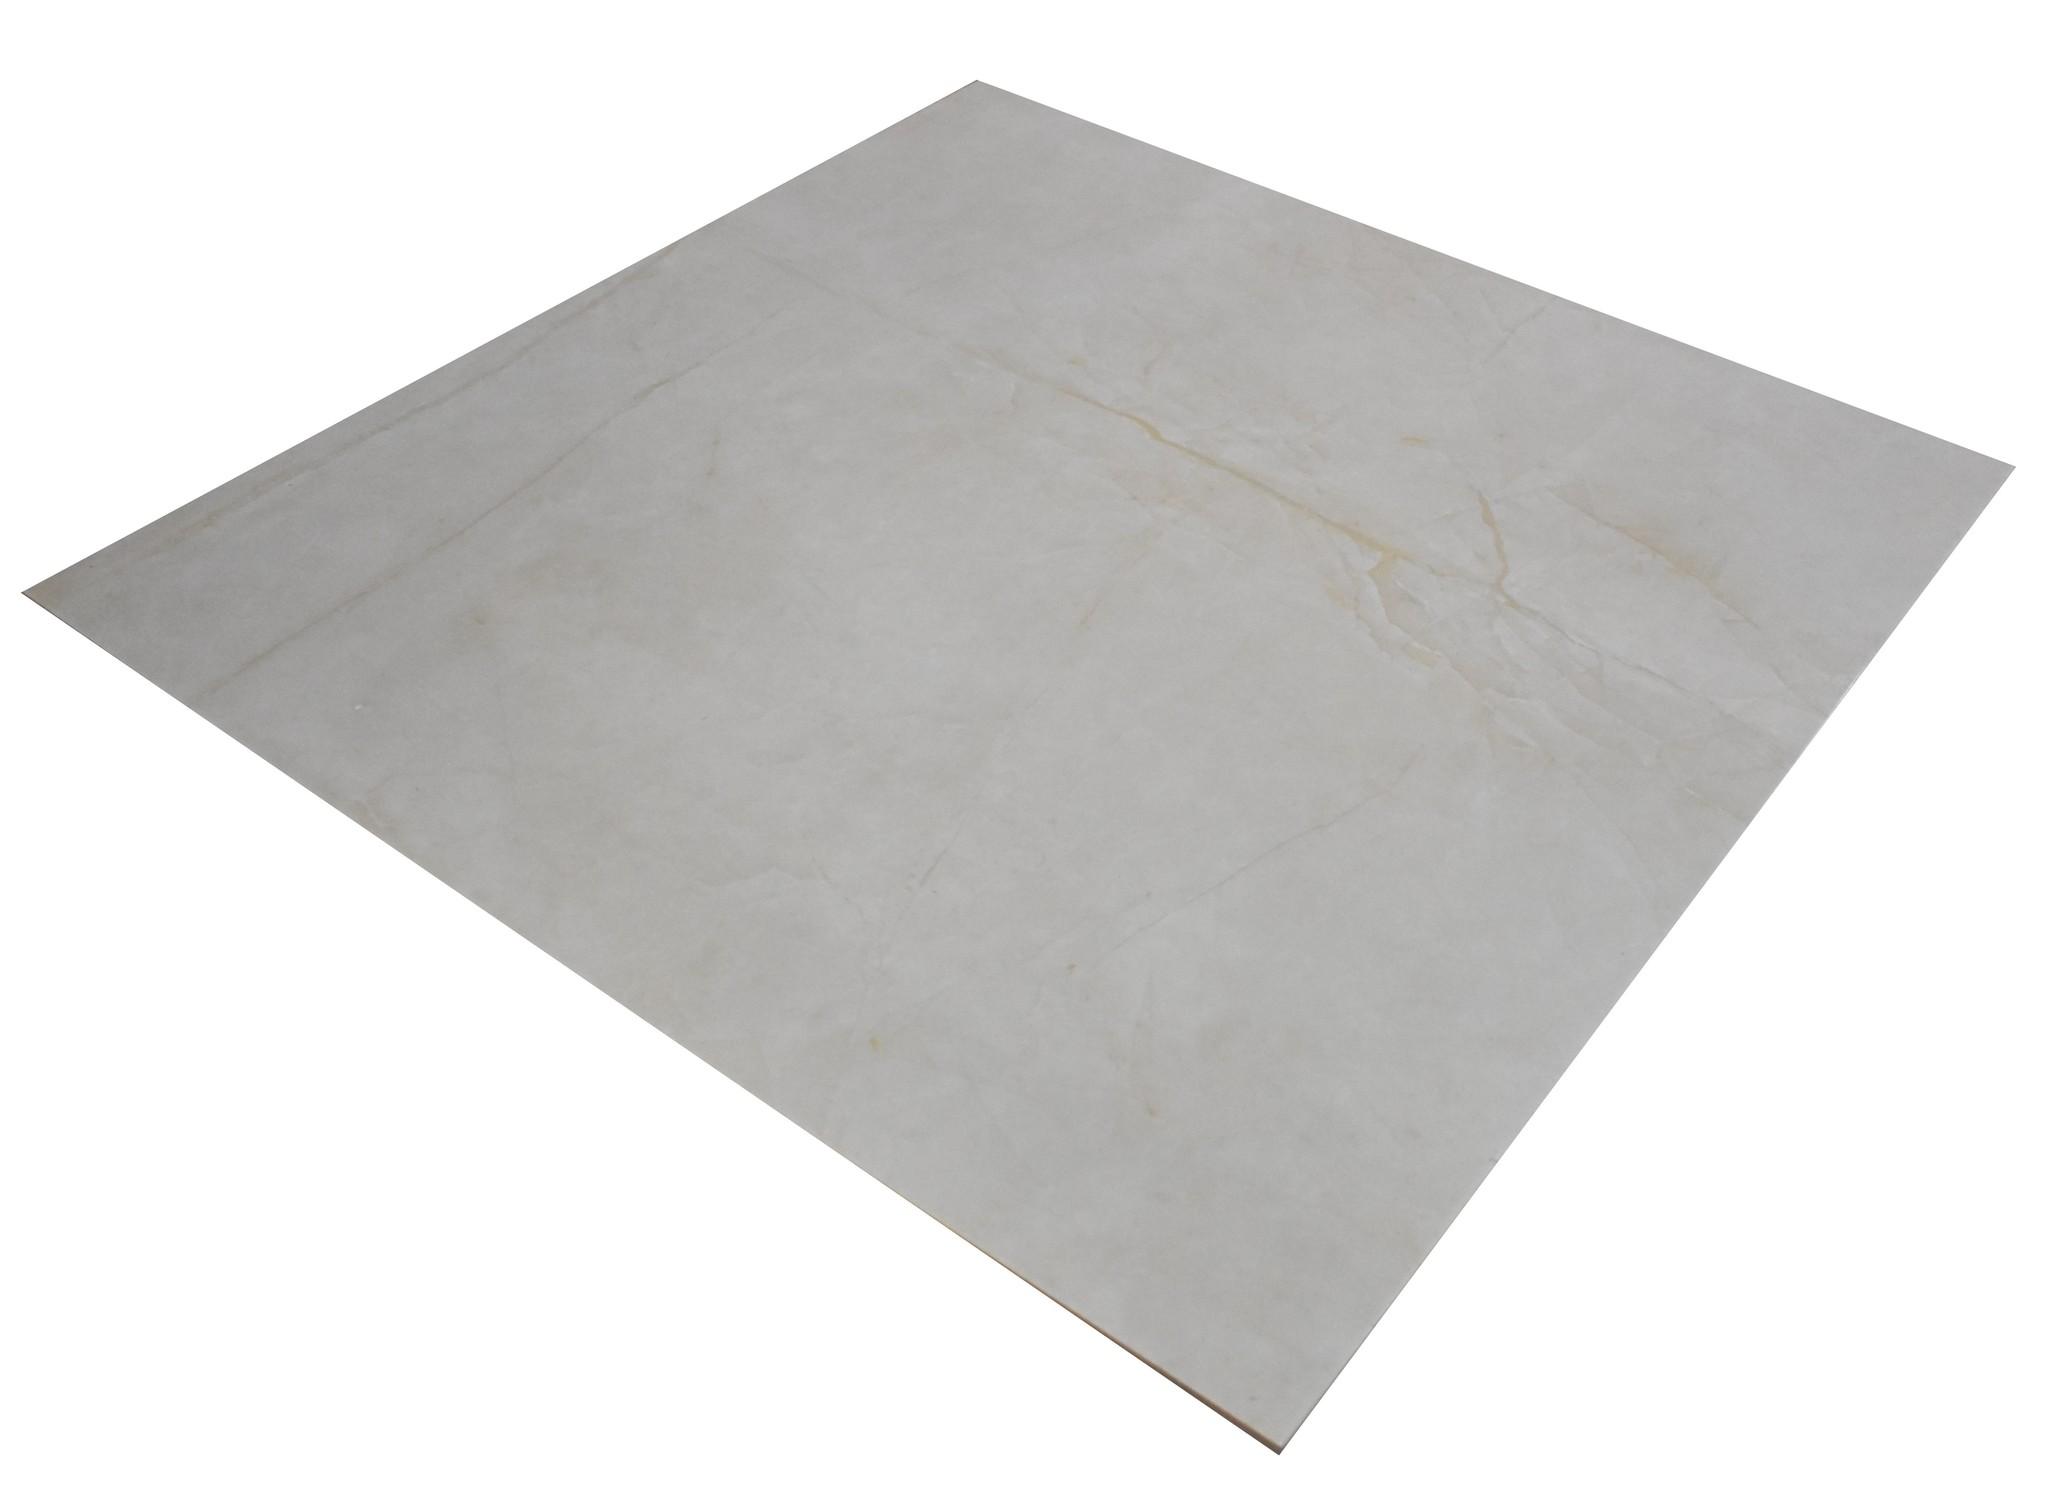 Montocoto Crema Płytki podłogowe